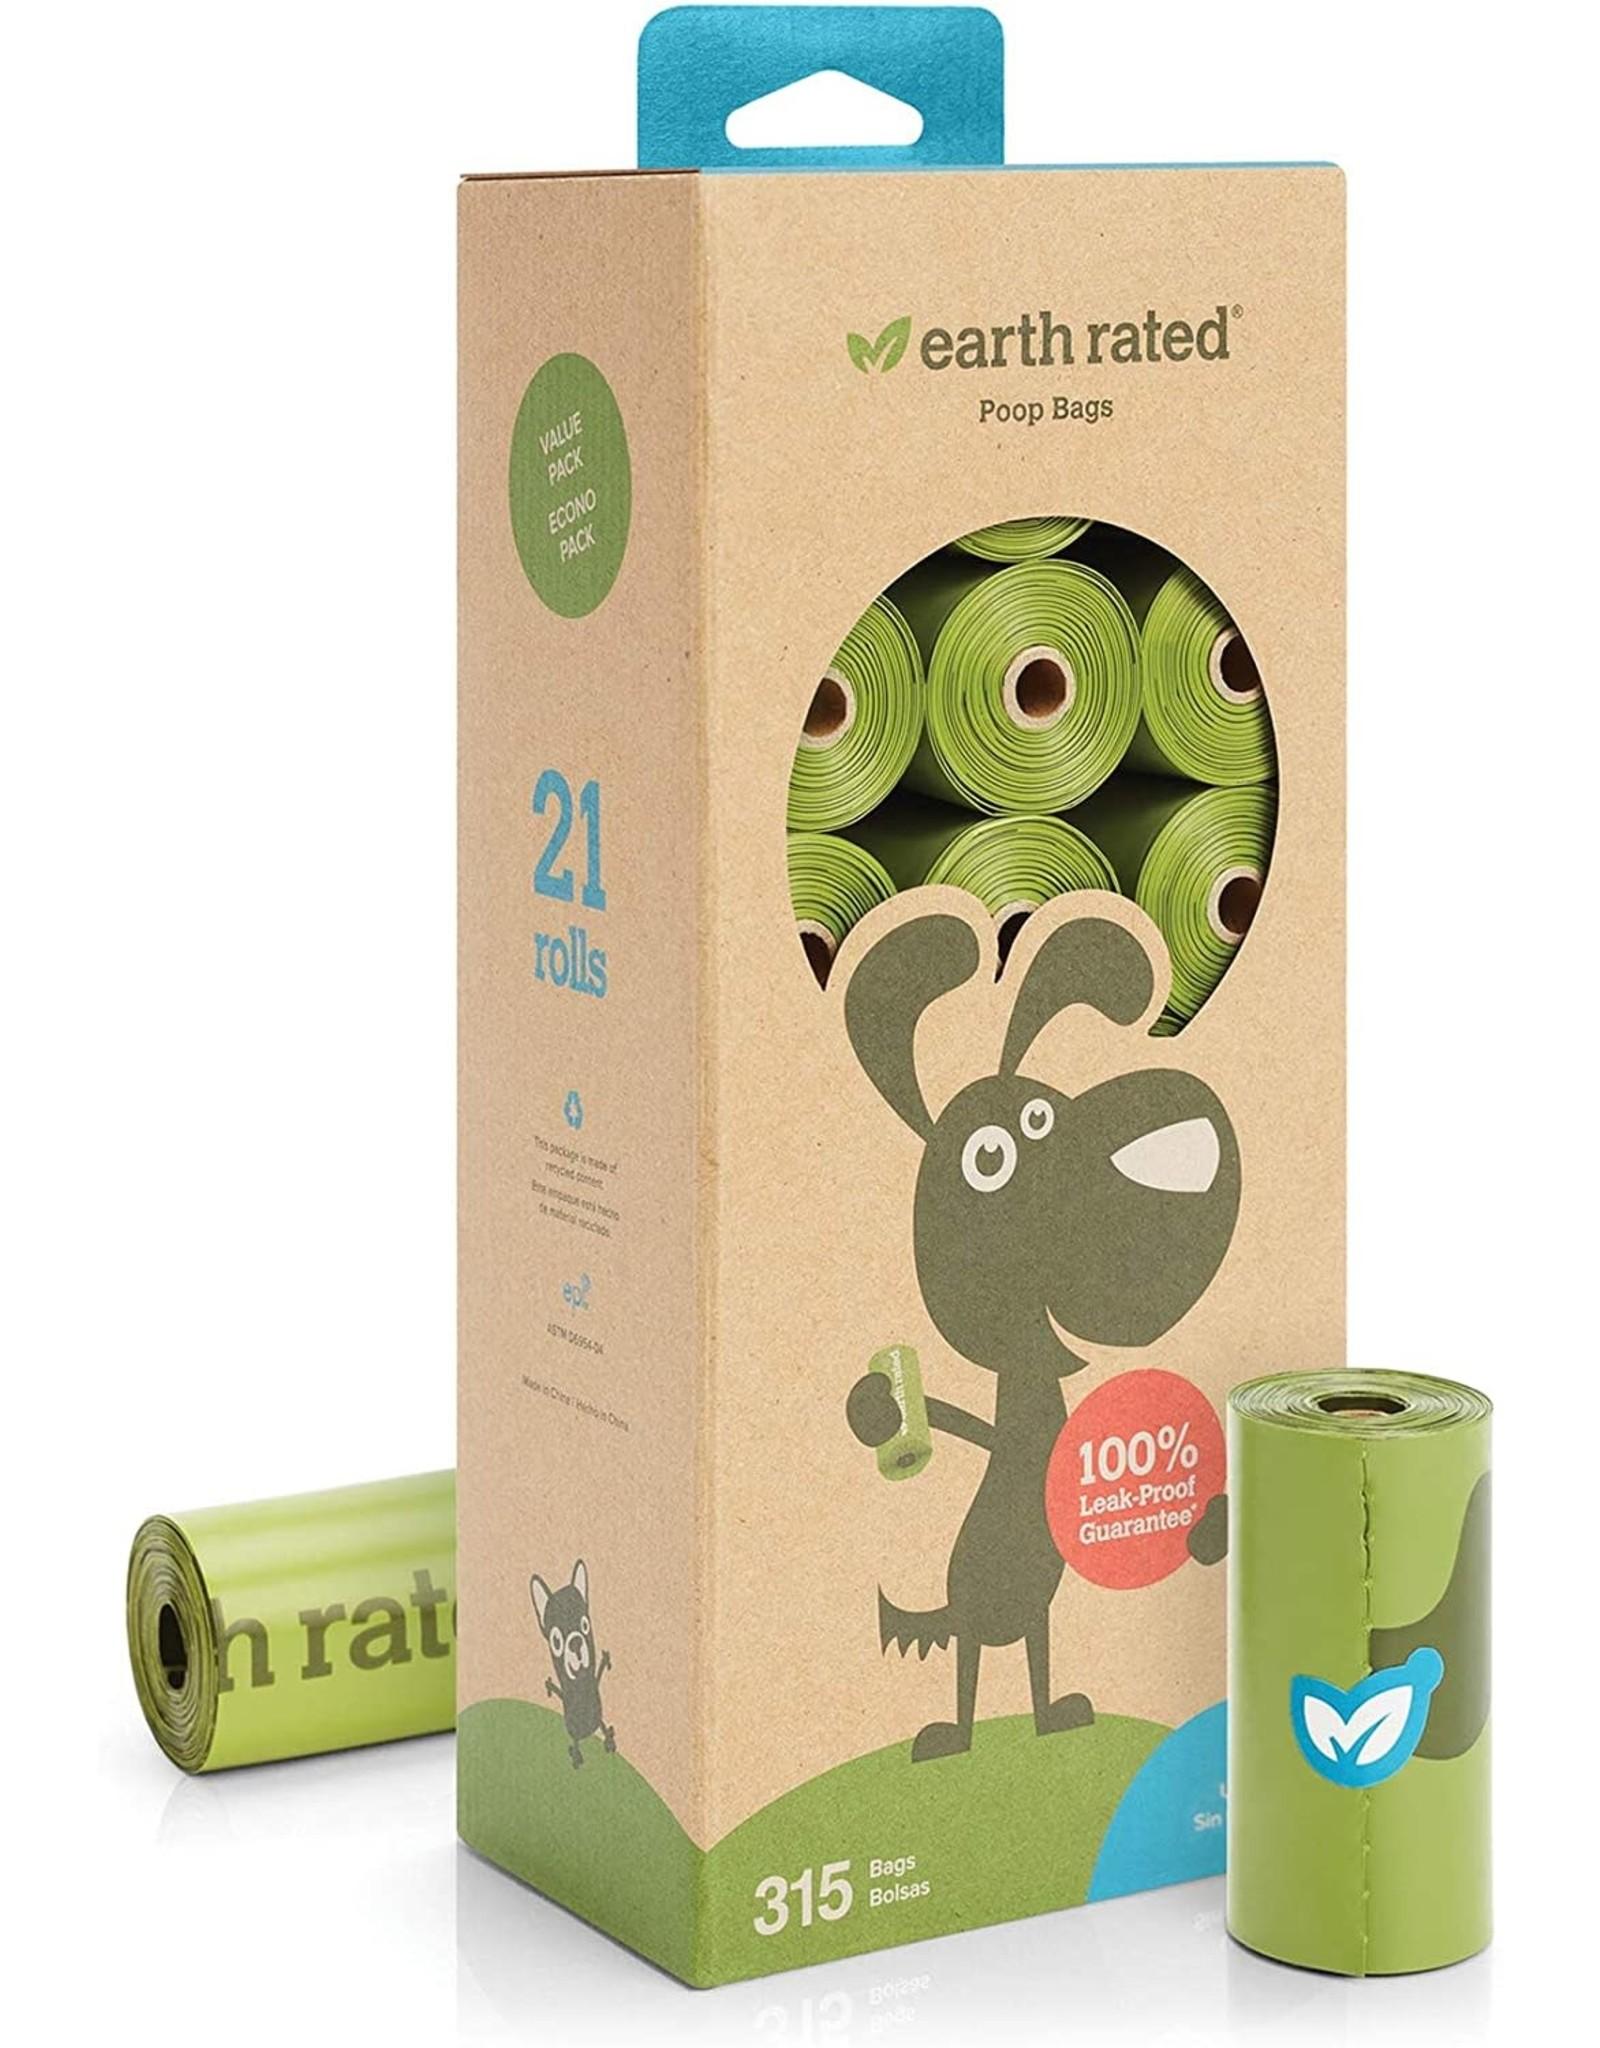 Earthrate Poop Bags Earthrated Poop Bags \ Unscented \ Refill Rolls Bulk (315 Bags)